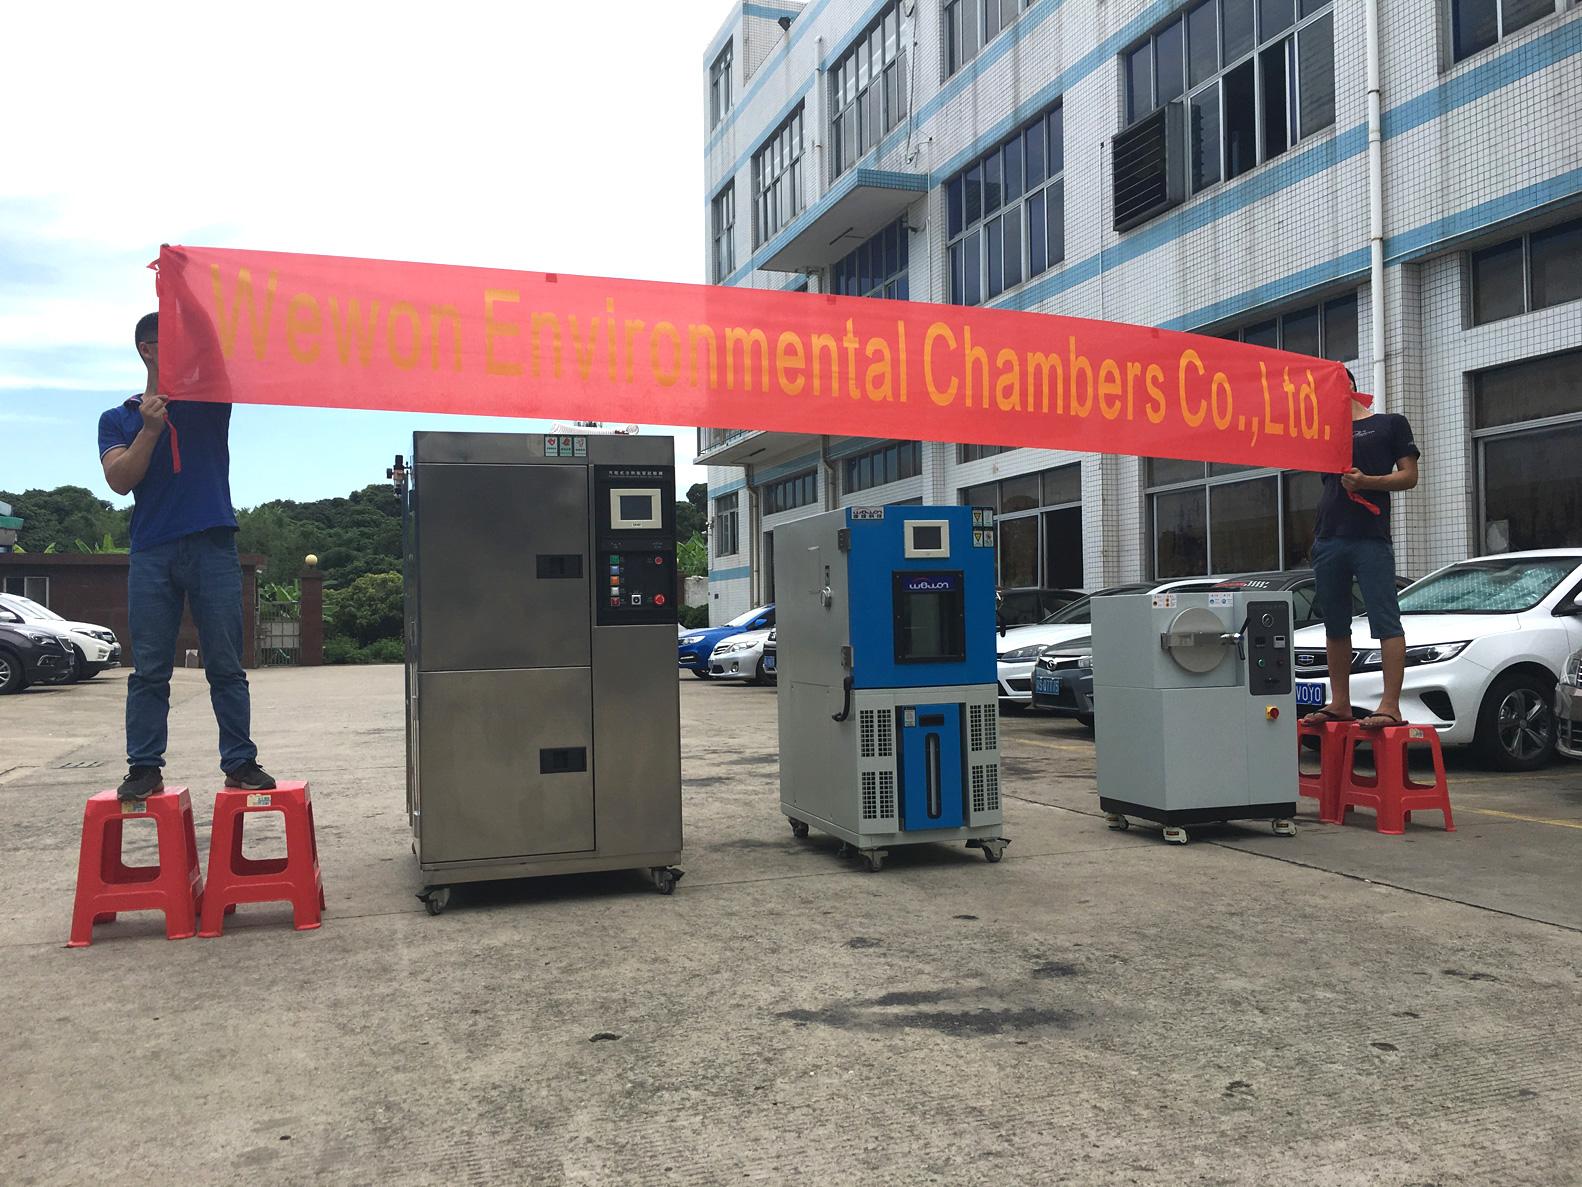 2018-07-30 Shipment | Thermal Shock Chamber | Enviornmental Chamber | Pressure Cooker Tester